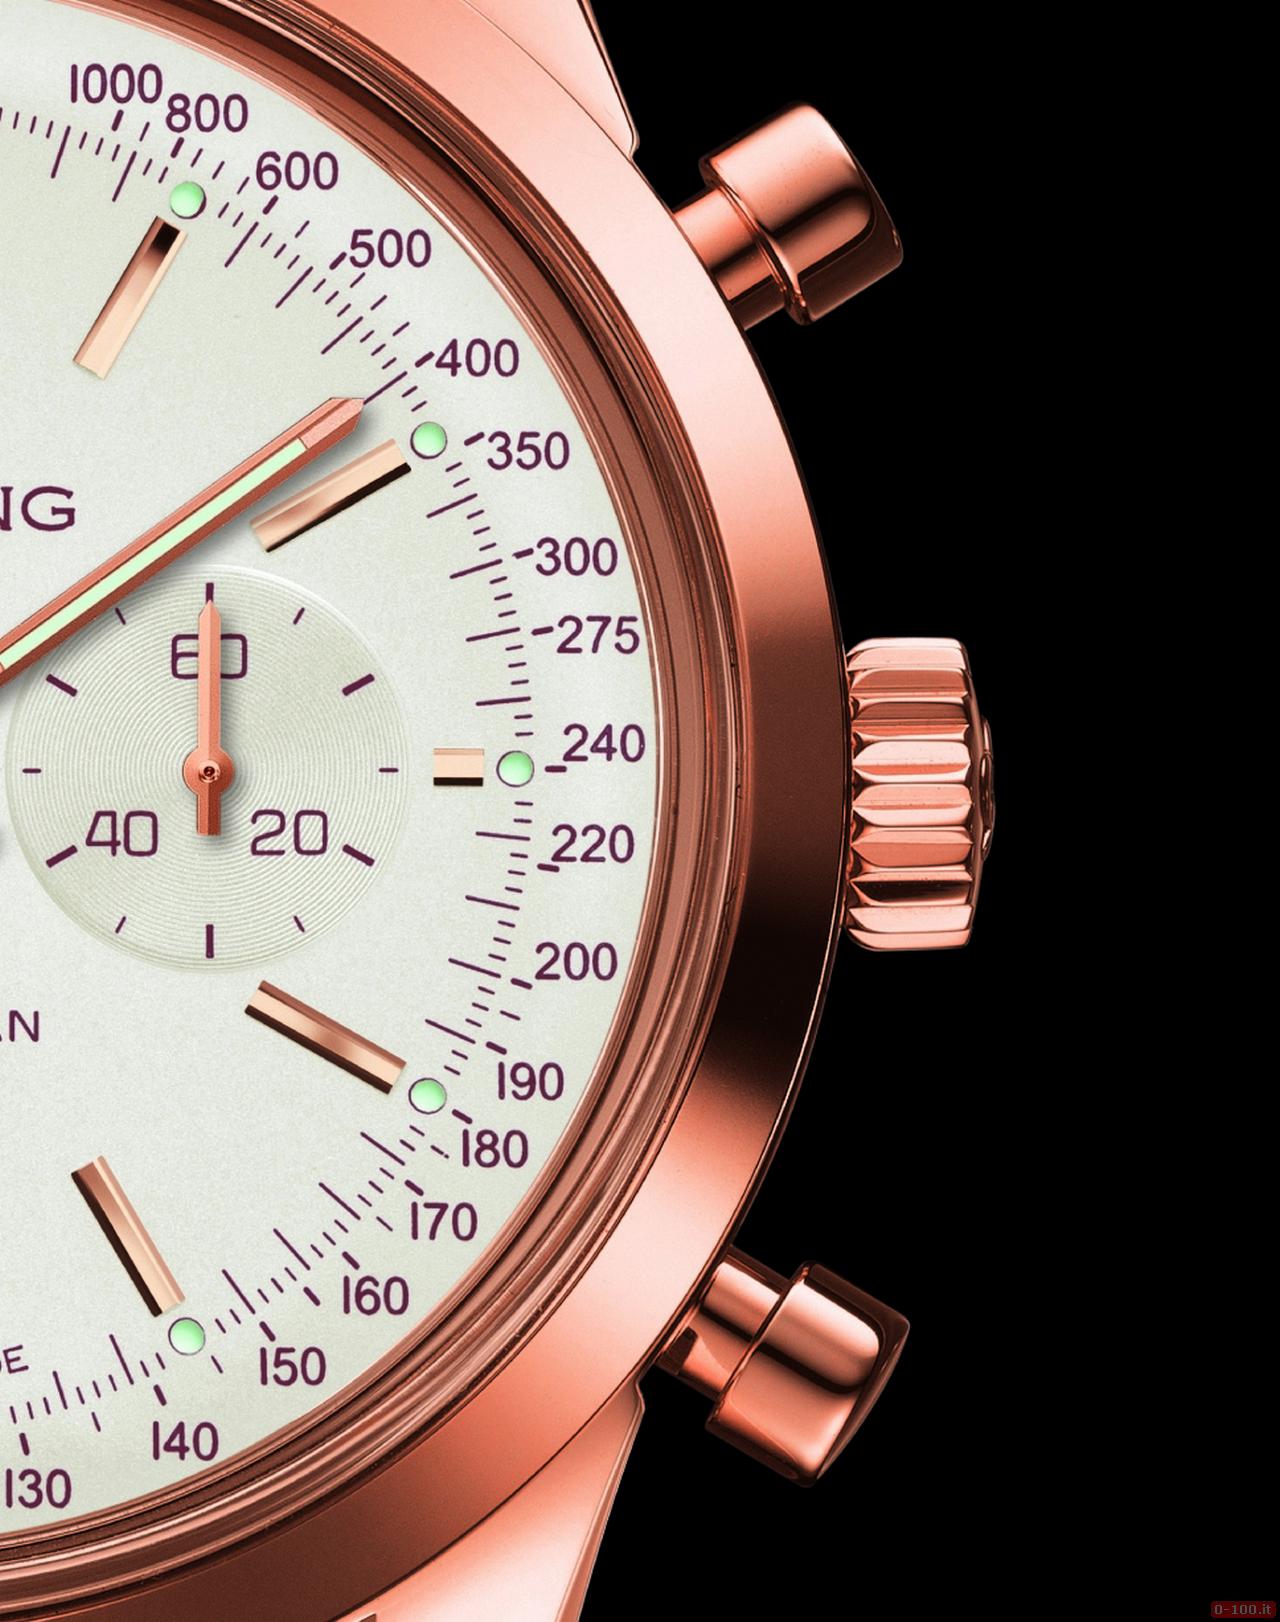 baselworld-2013-breitling-transocean-chronograph-38_0-100 4